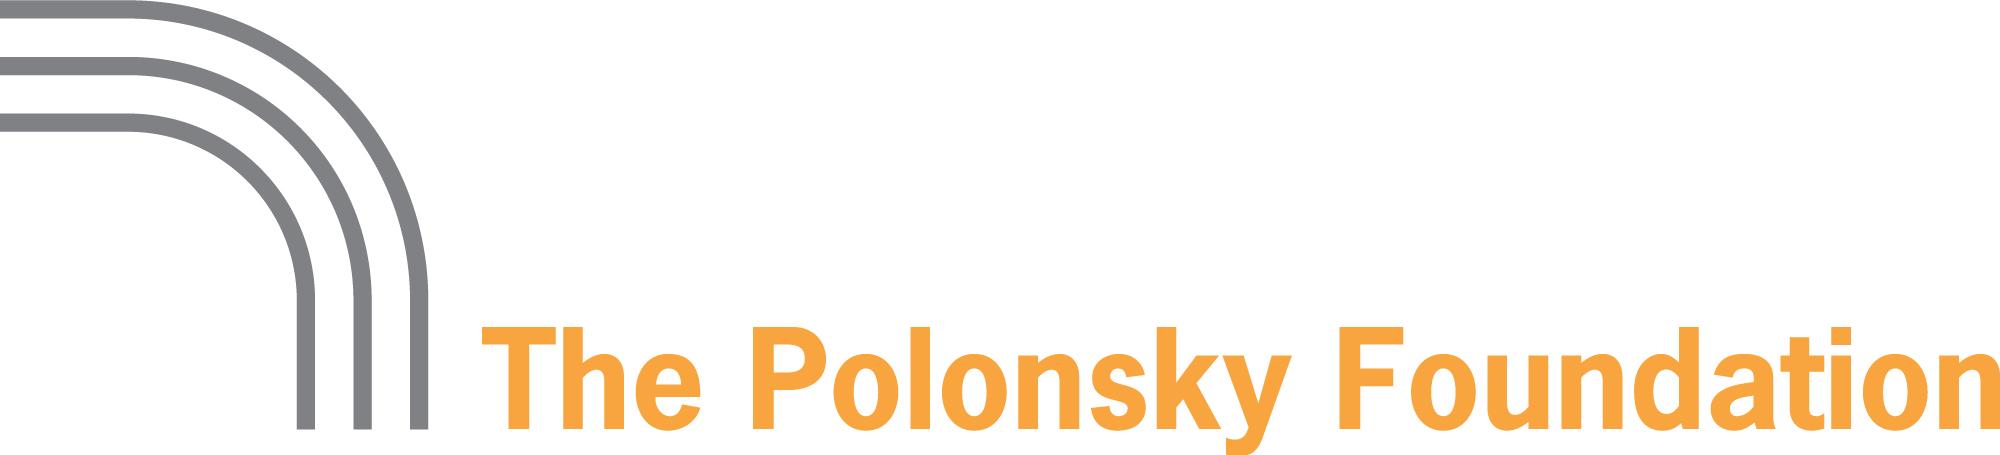 The Polonsky Foundation